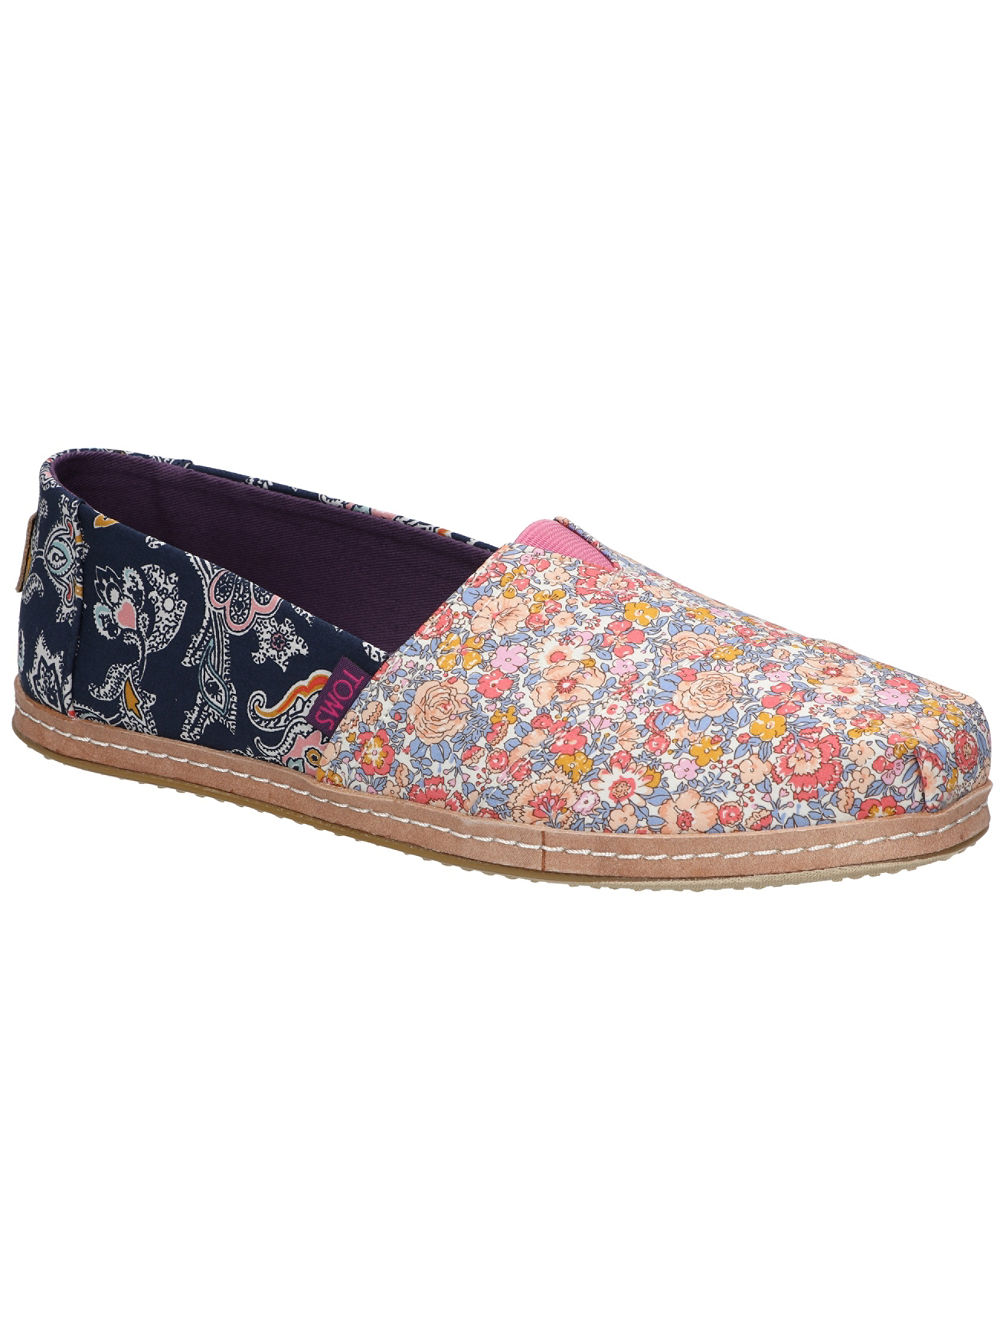 sports shoes 9e2b8 bf87b Alpargata Slip-Ons